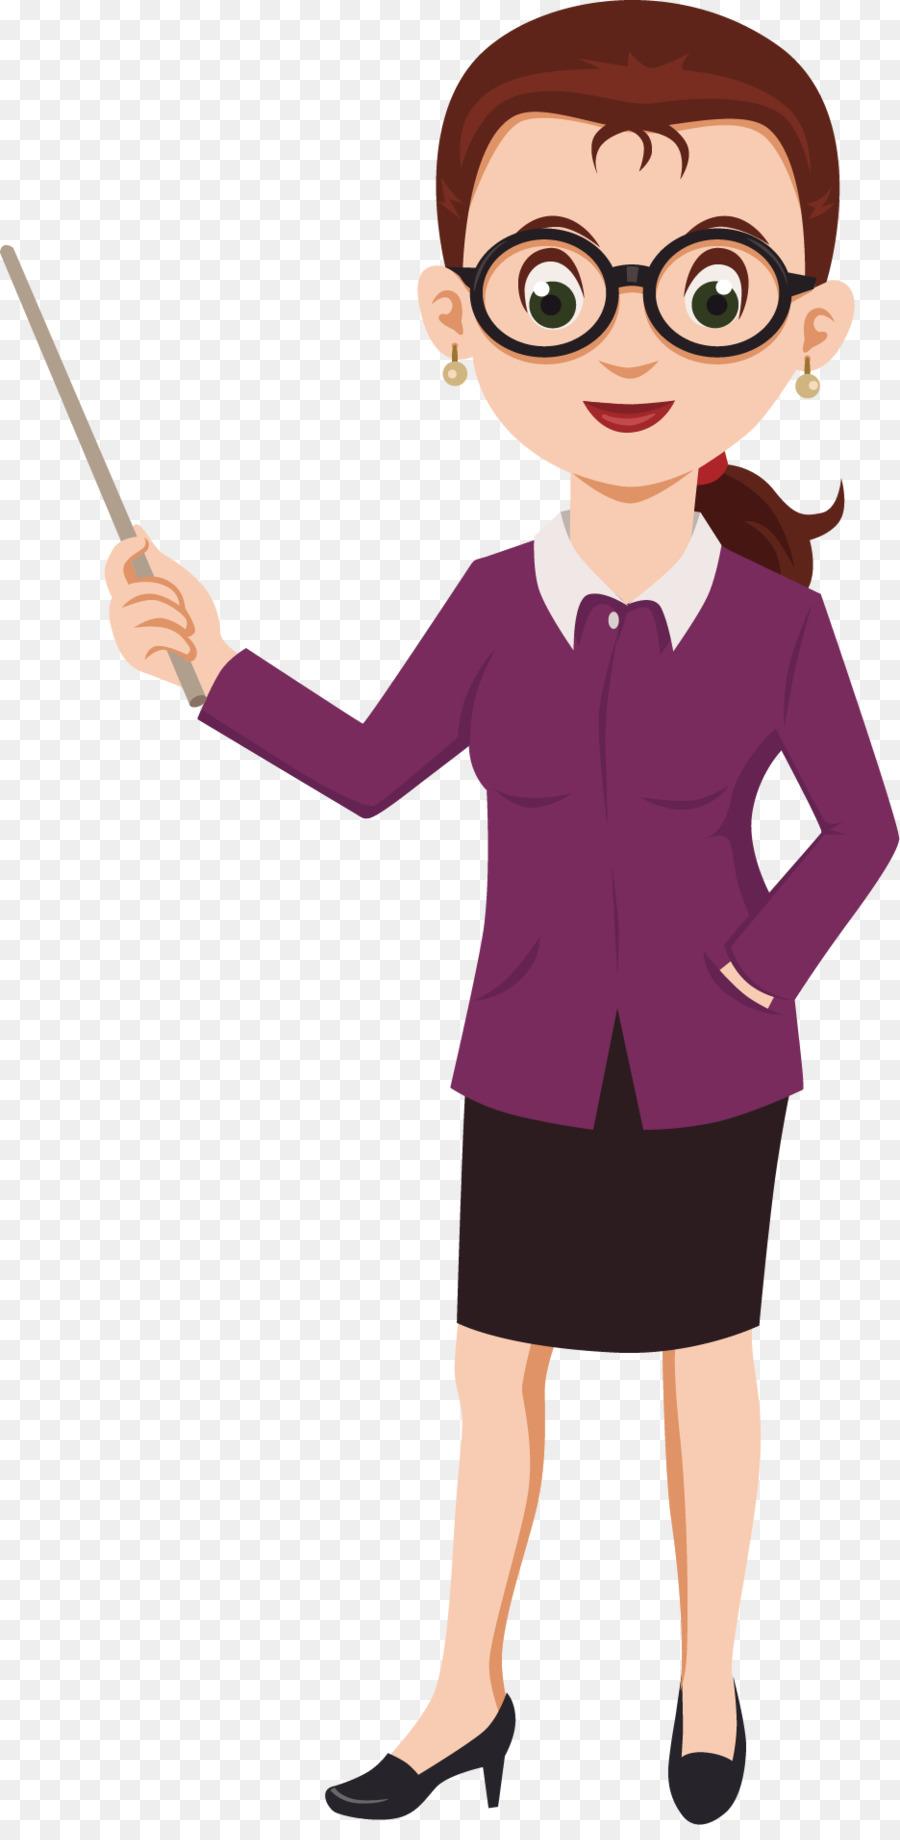 Cartoon female teacher clipart